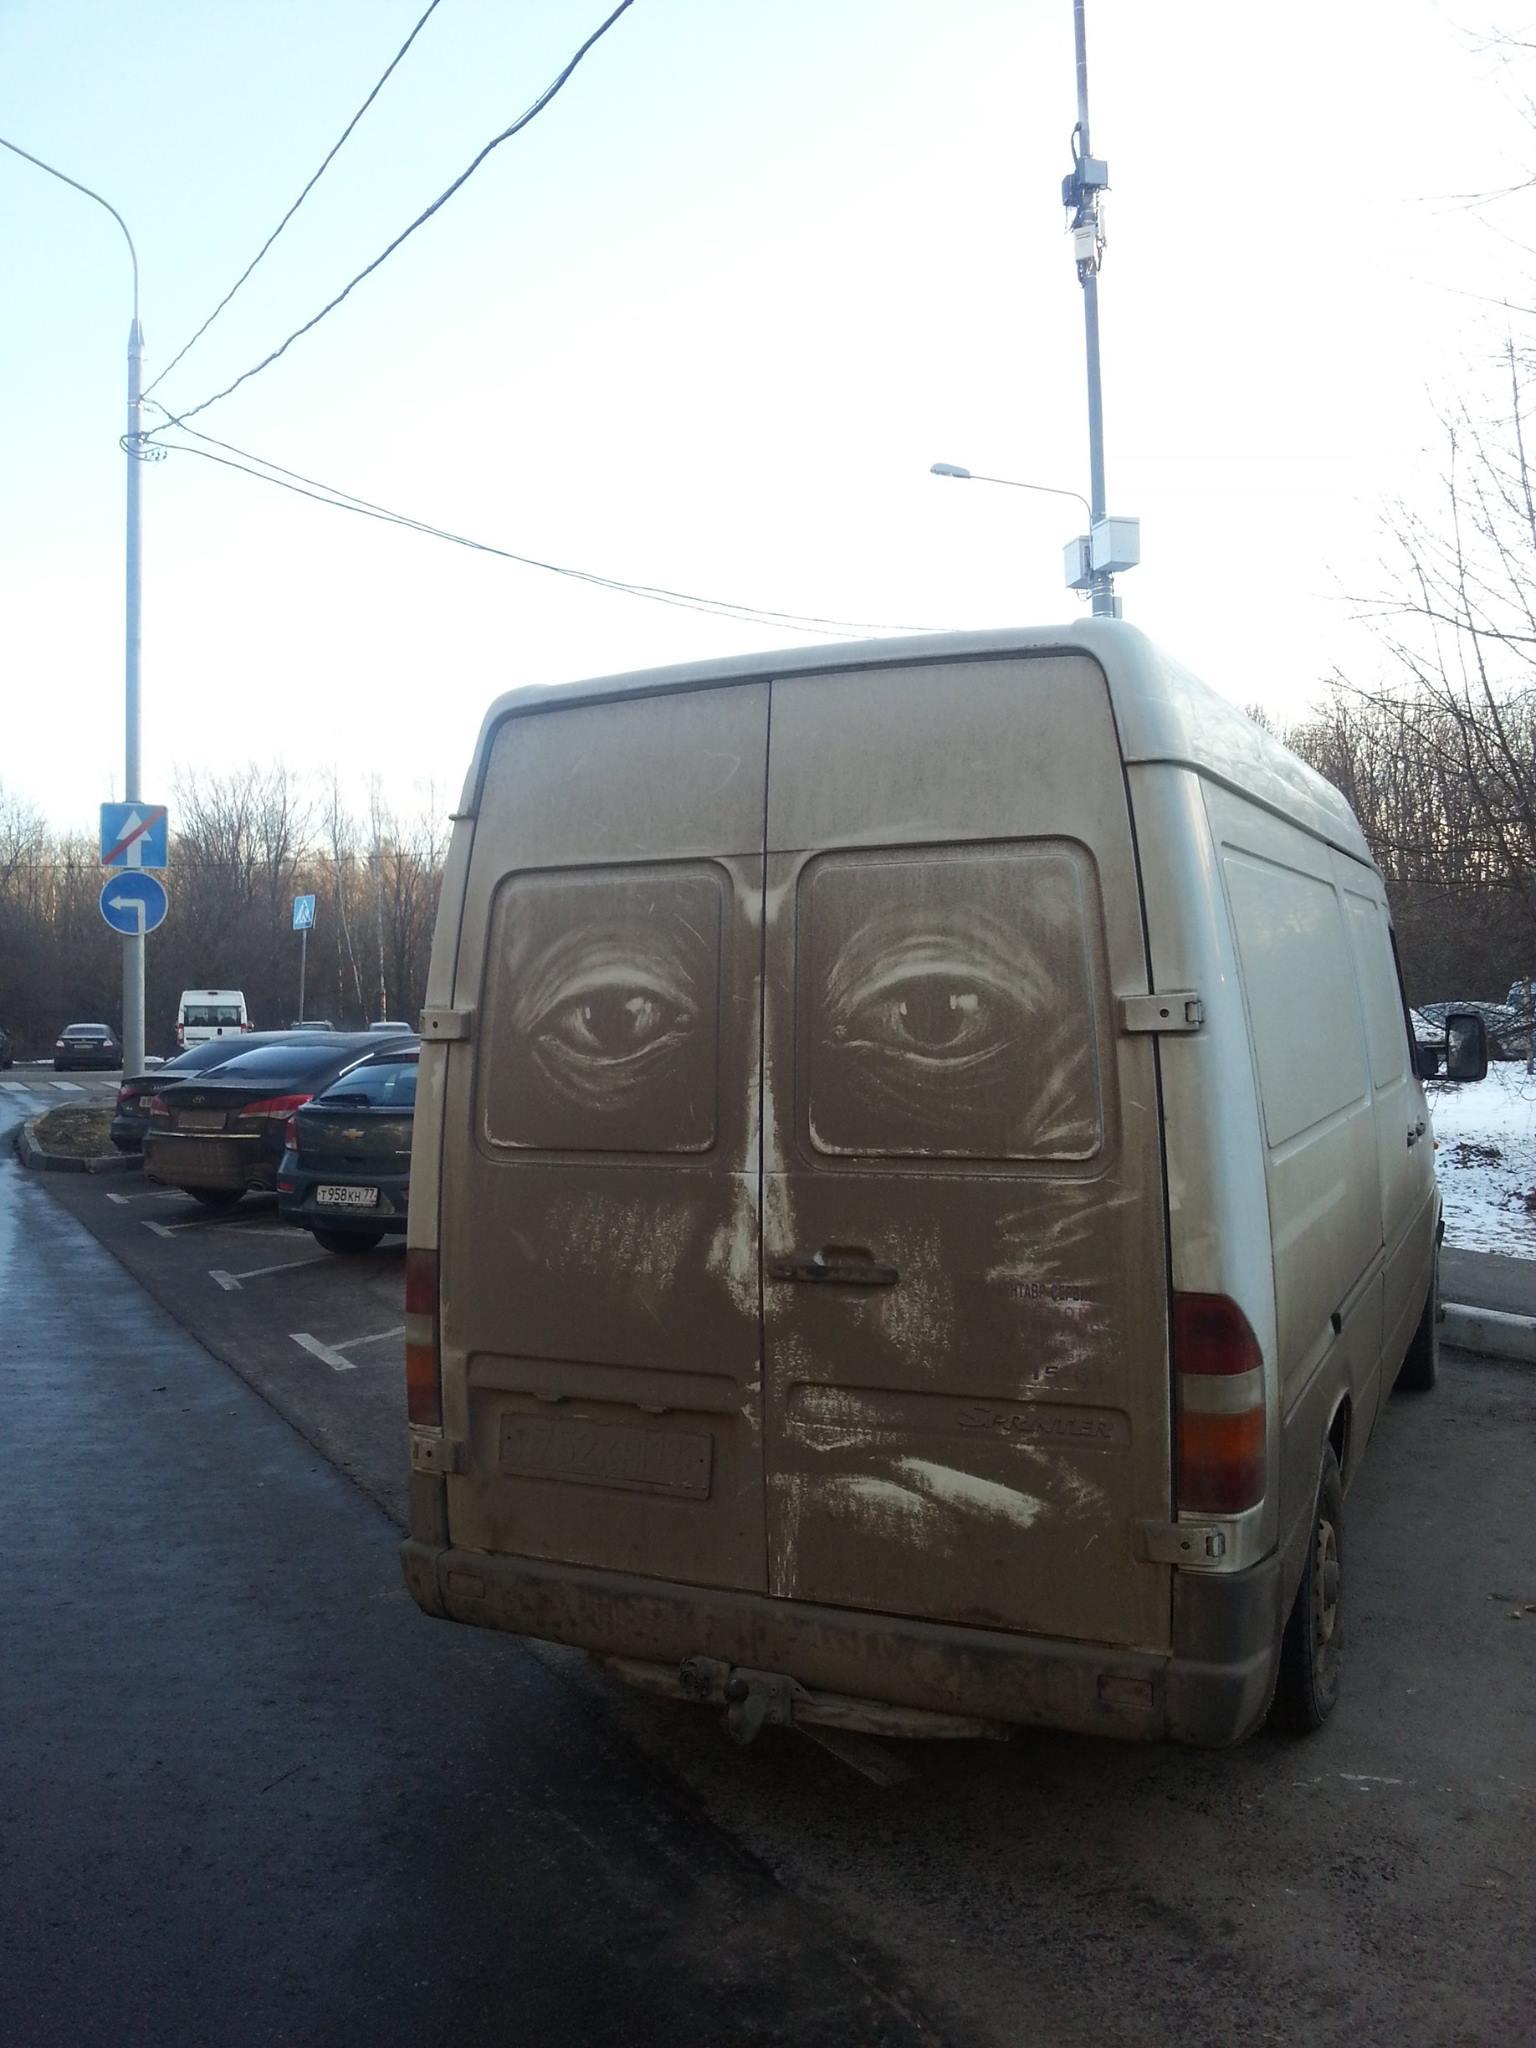 Nikita Golubev-3